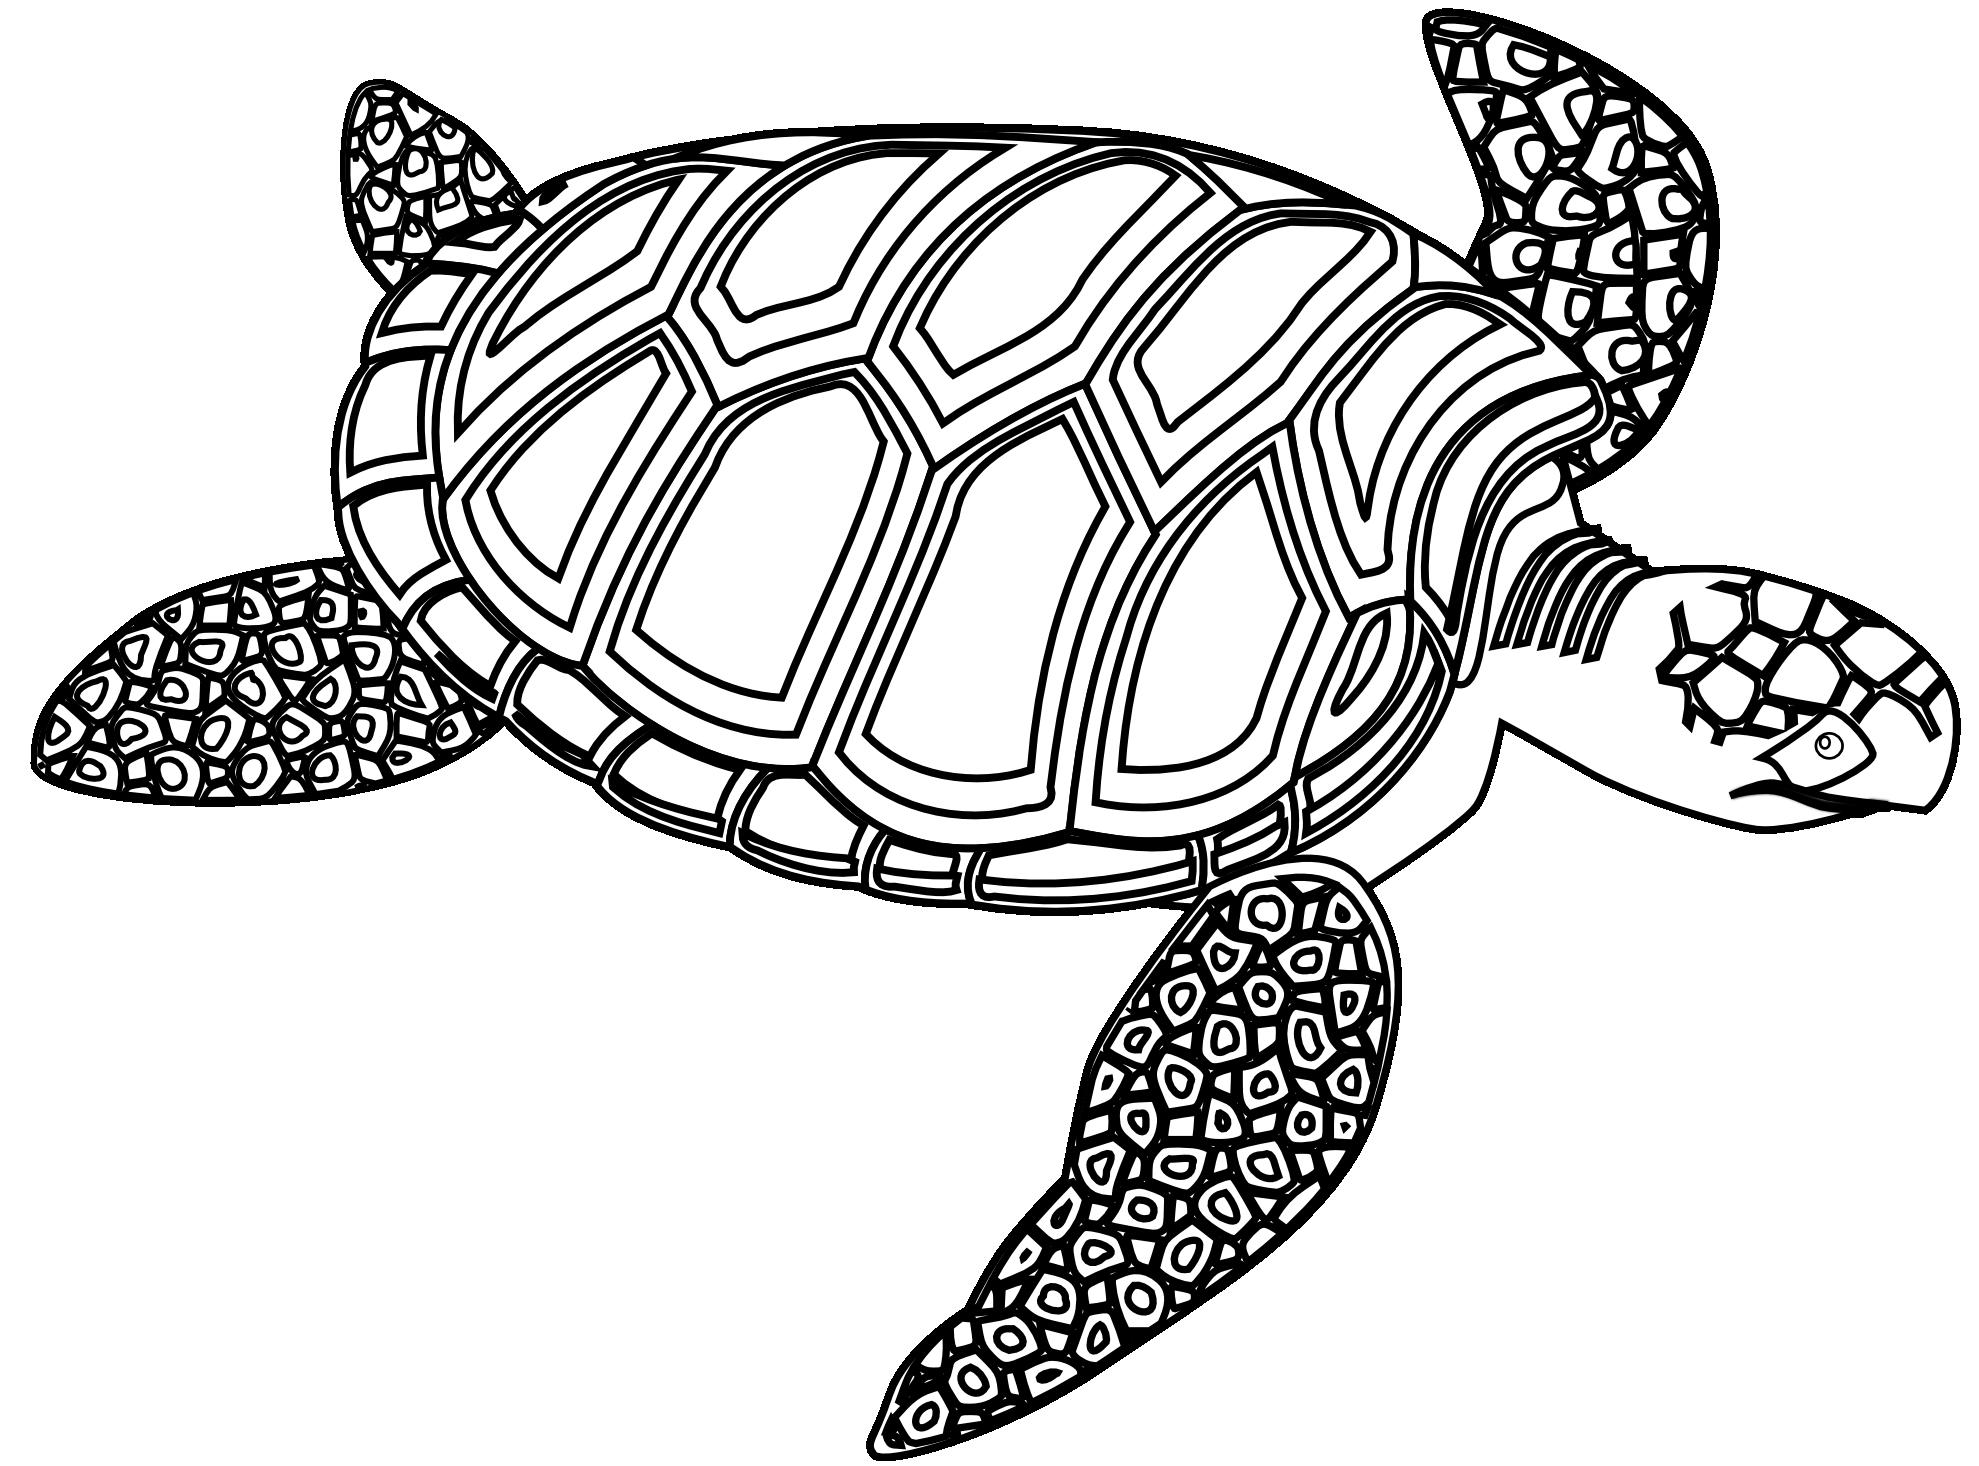 Drawn sea turtle black and white Clipart Panda Turtle Hawaiian Sea